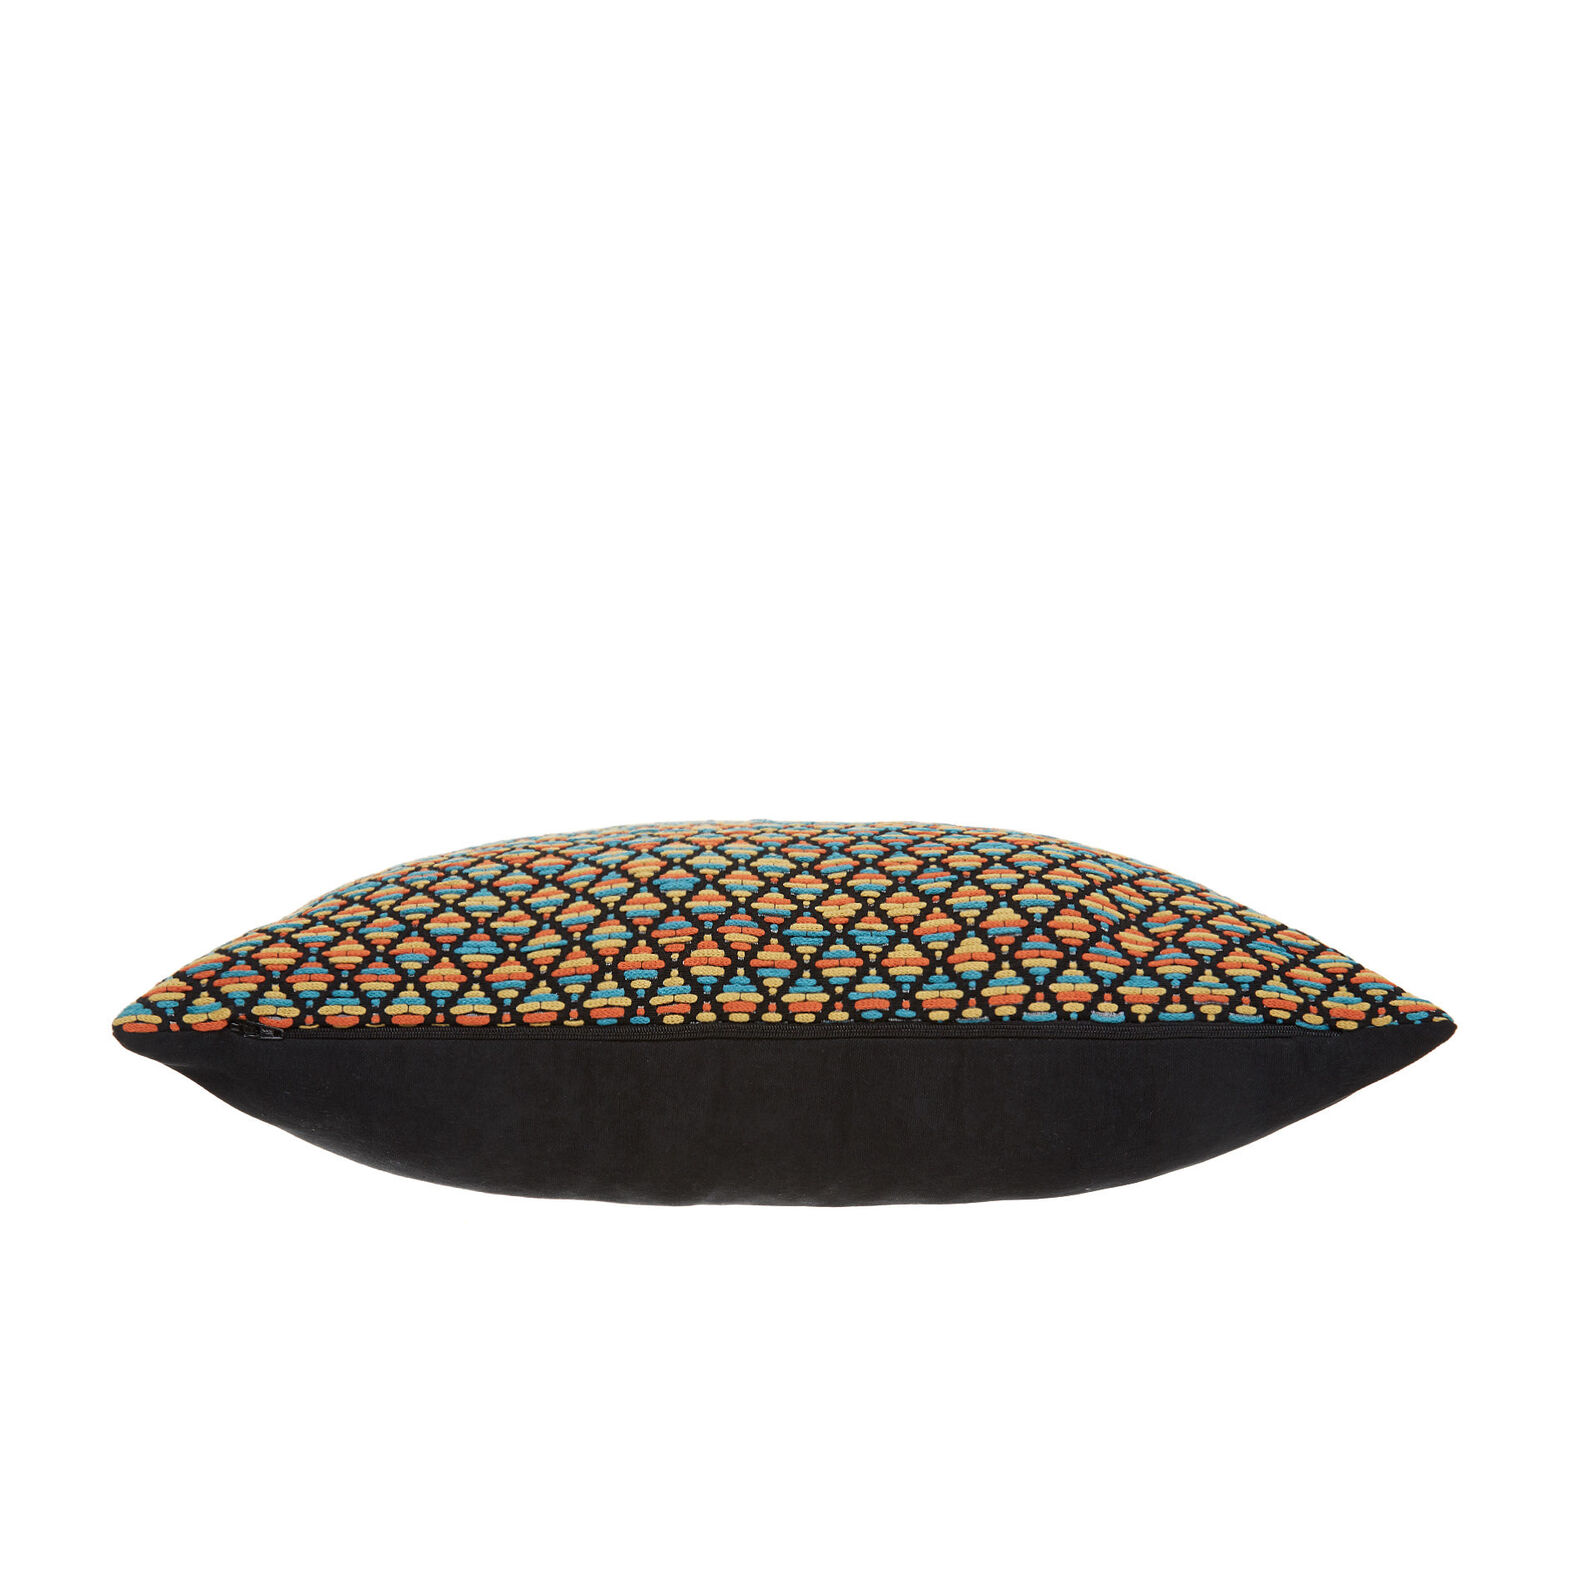 Cushion with zigzag motif 35 x 55 cm